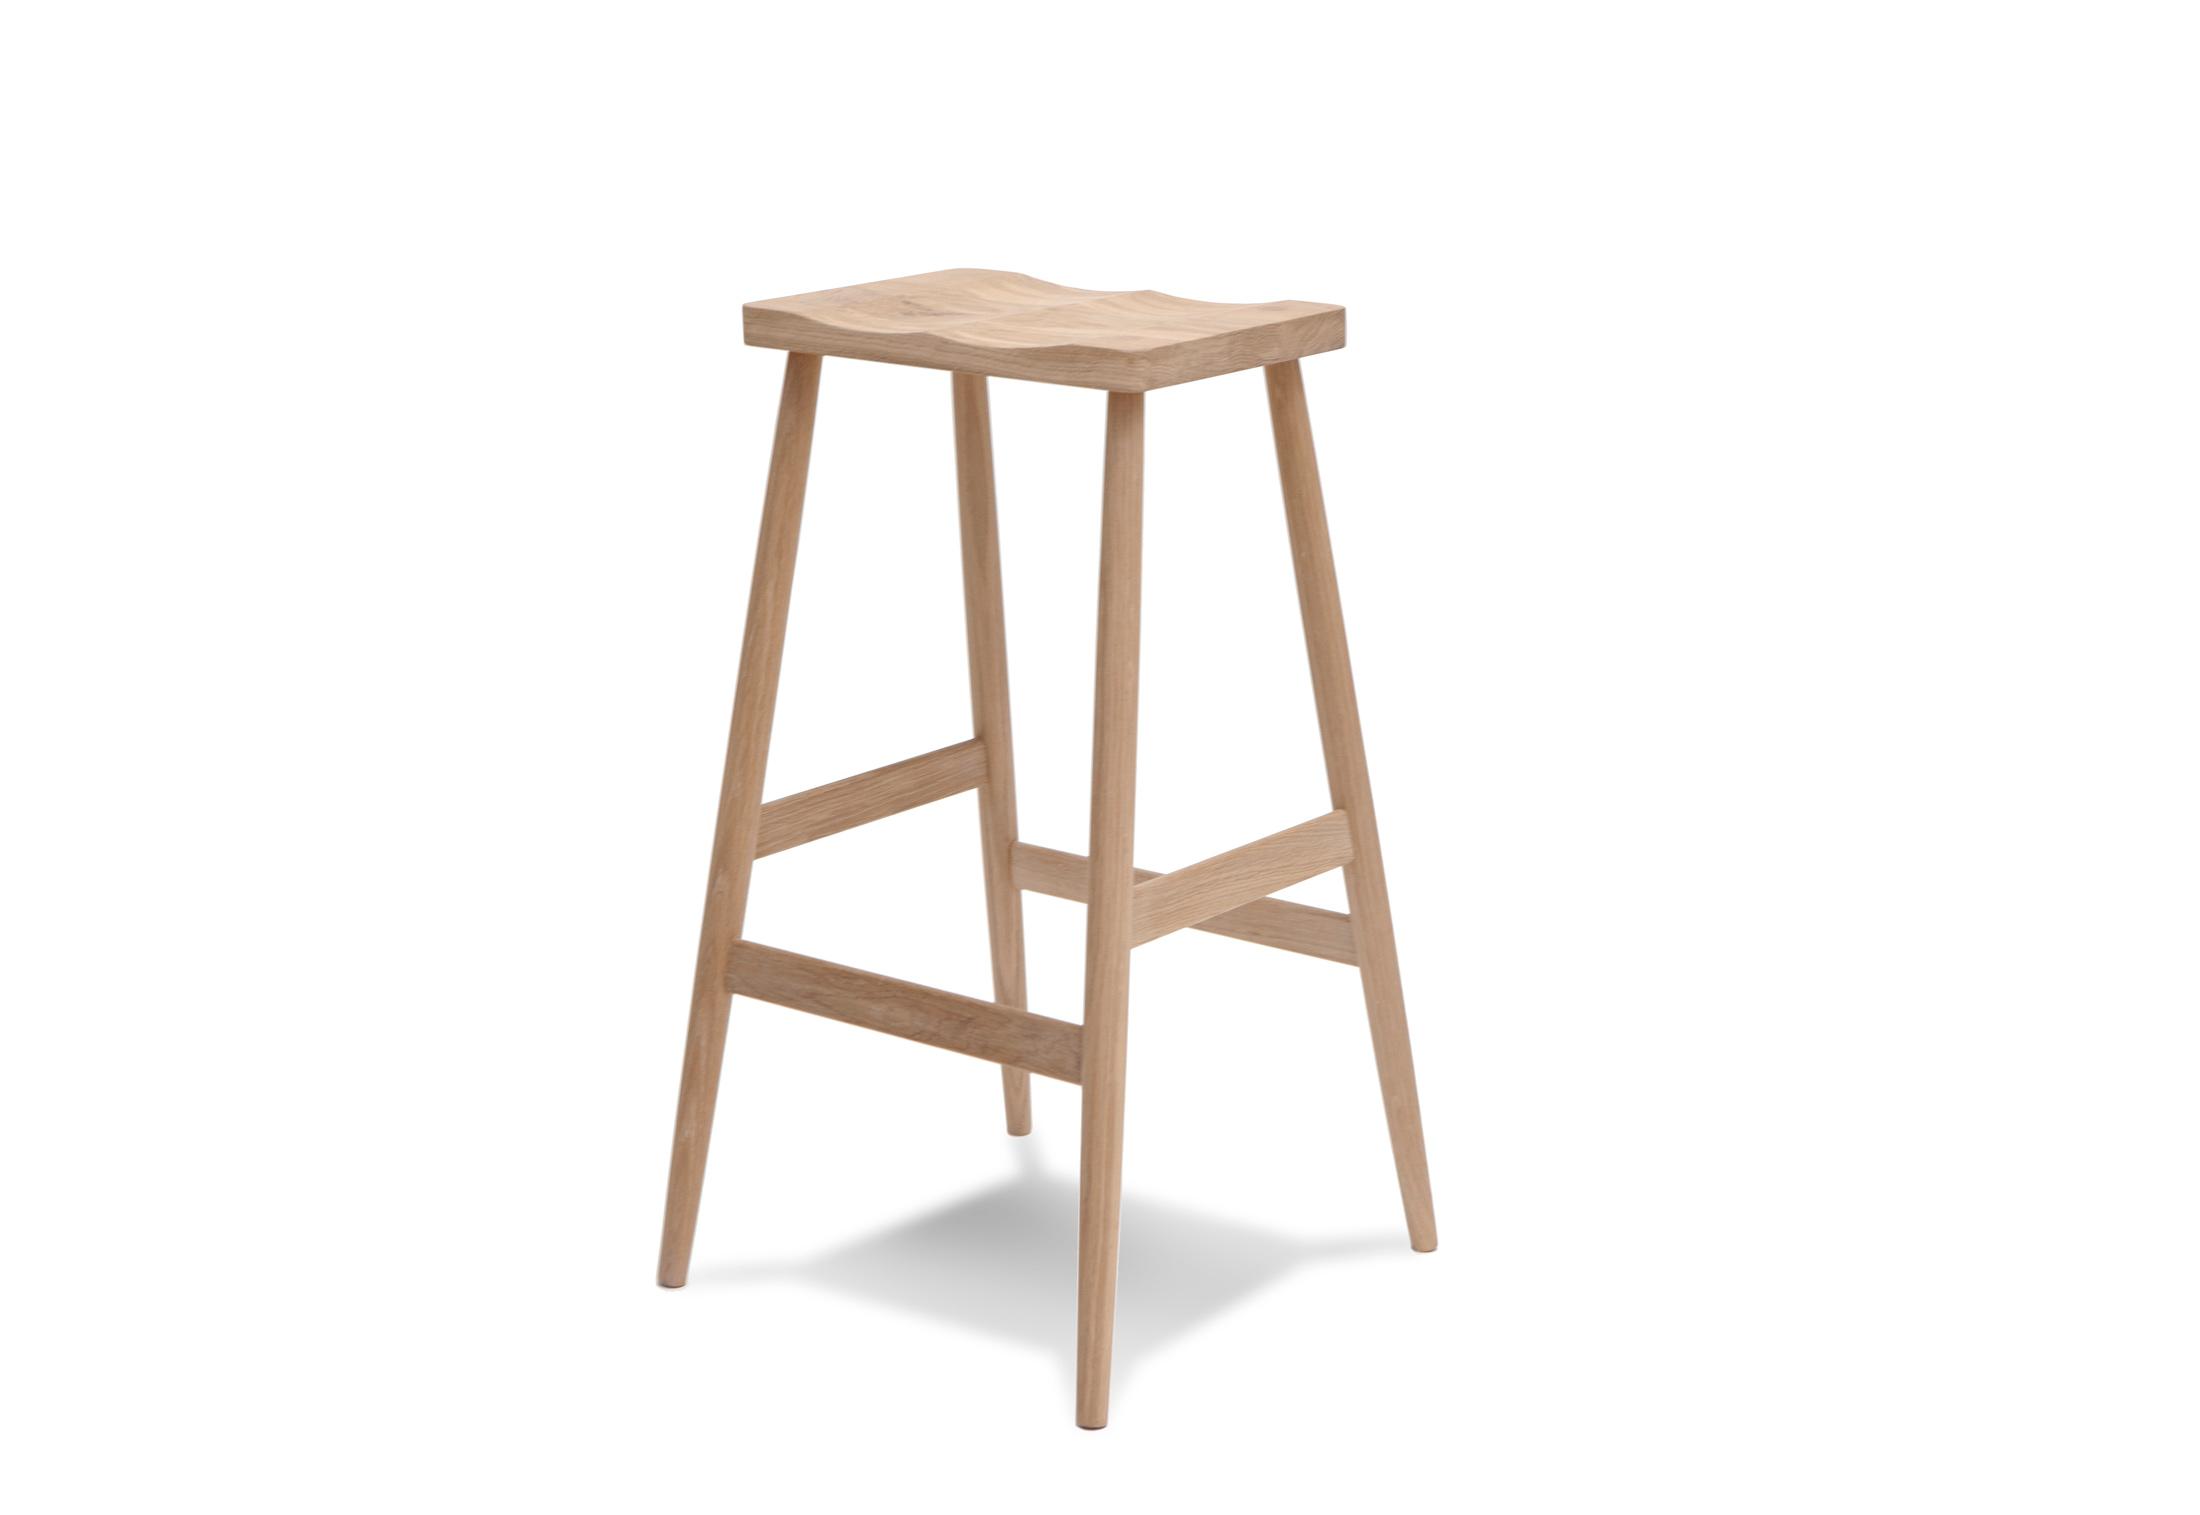 Groovy Imo Bar Stool By Pinch Stylepark Uwap Interior Chair Design Uwaporg